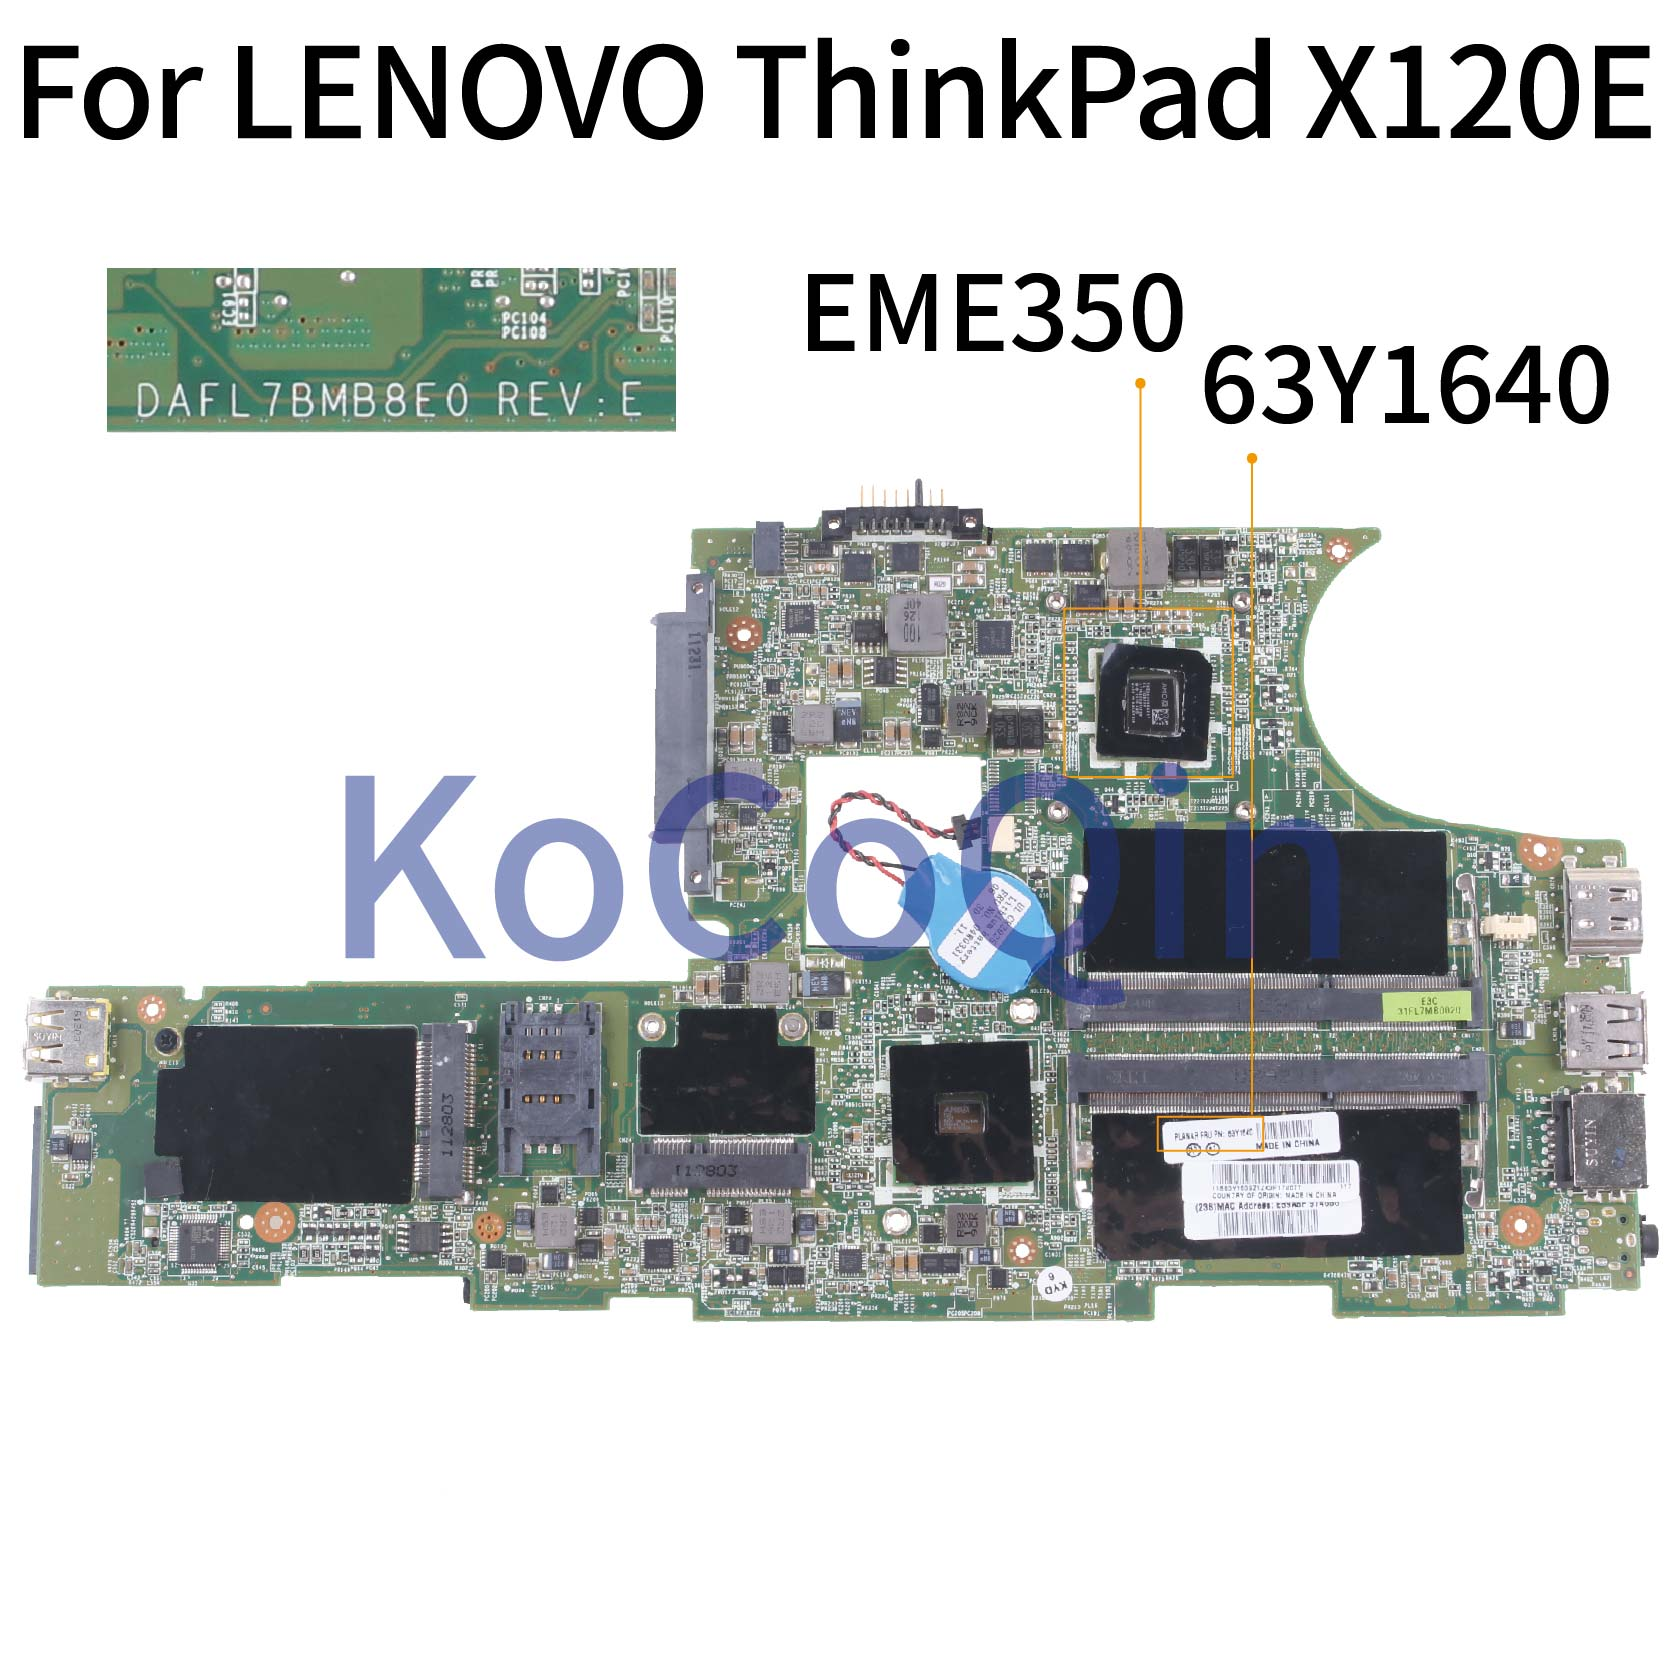 KoCoQin Laptop motherboard For LENOVO ThinkPad X120E Mainboard 63Y1640 04W0367 EME350